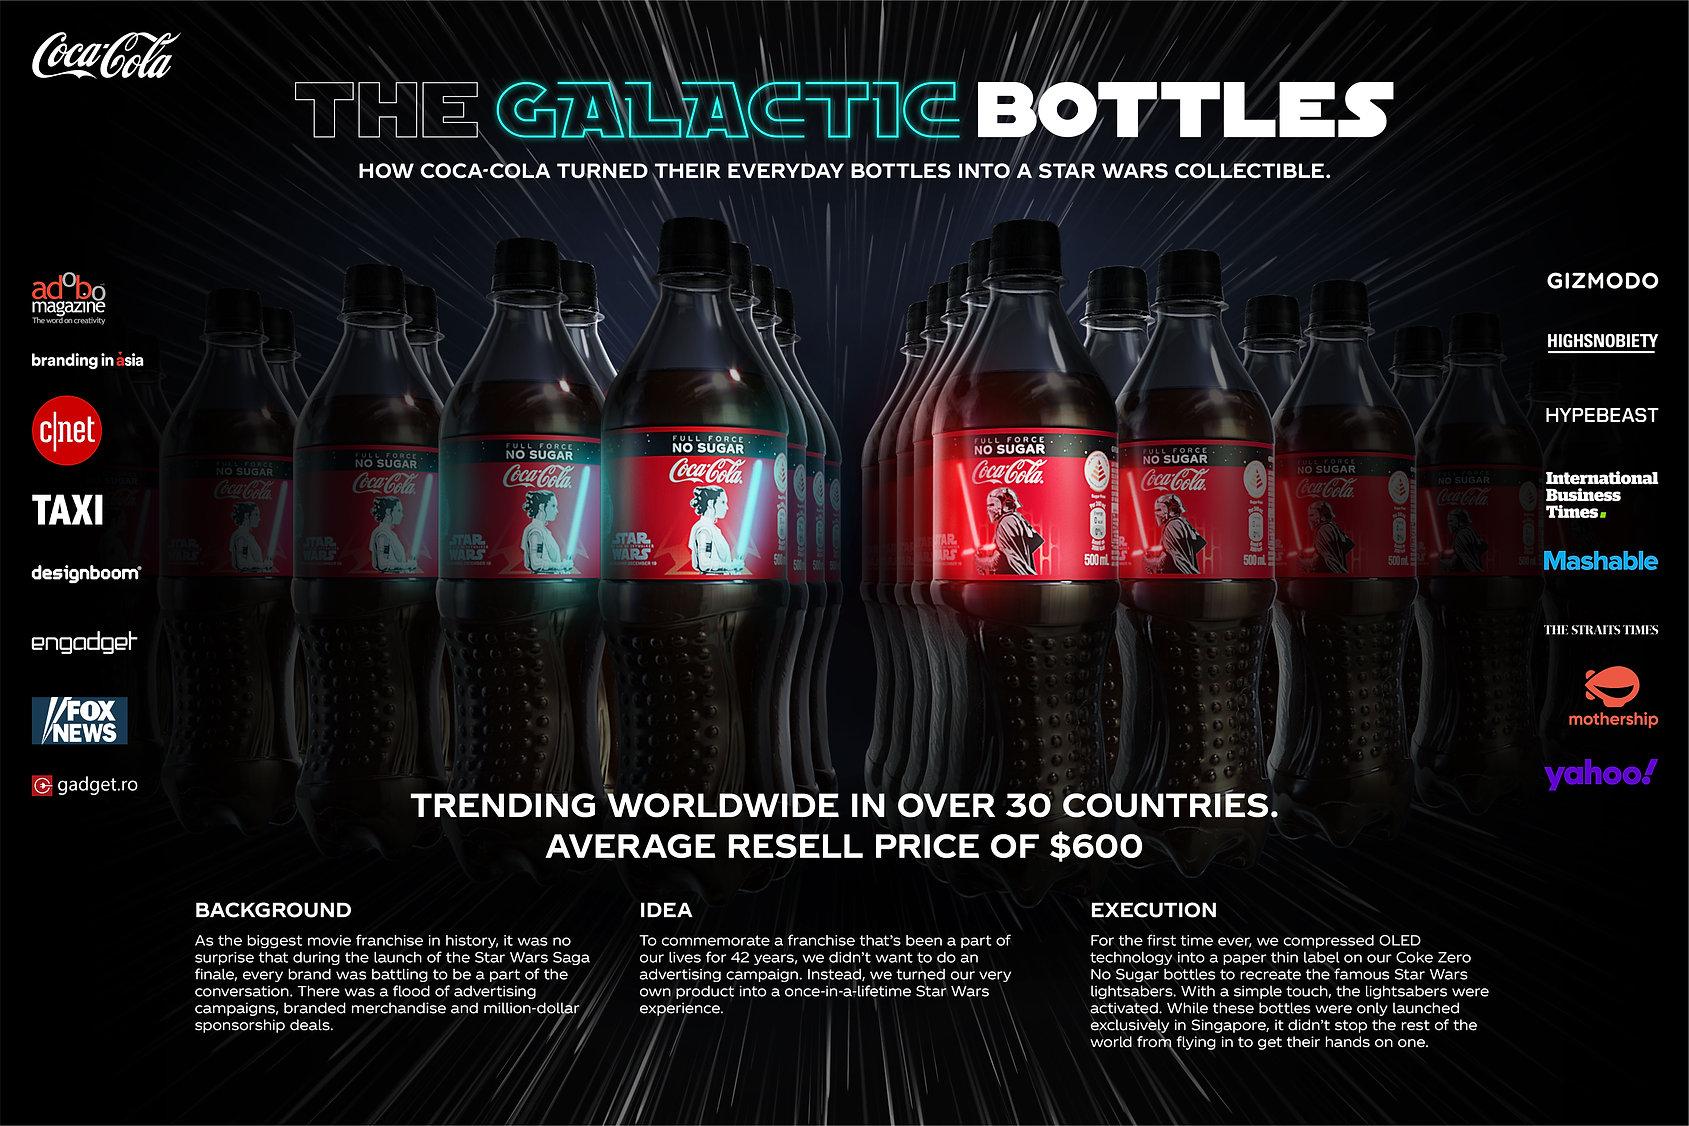 The Galactic Bottles Board.jpg